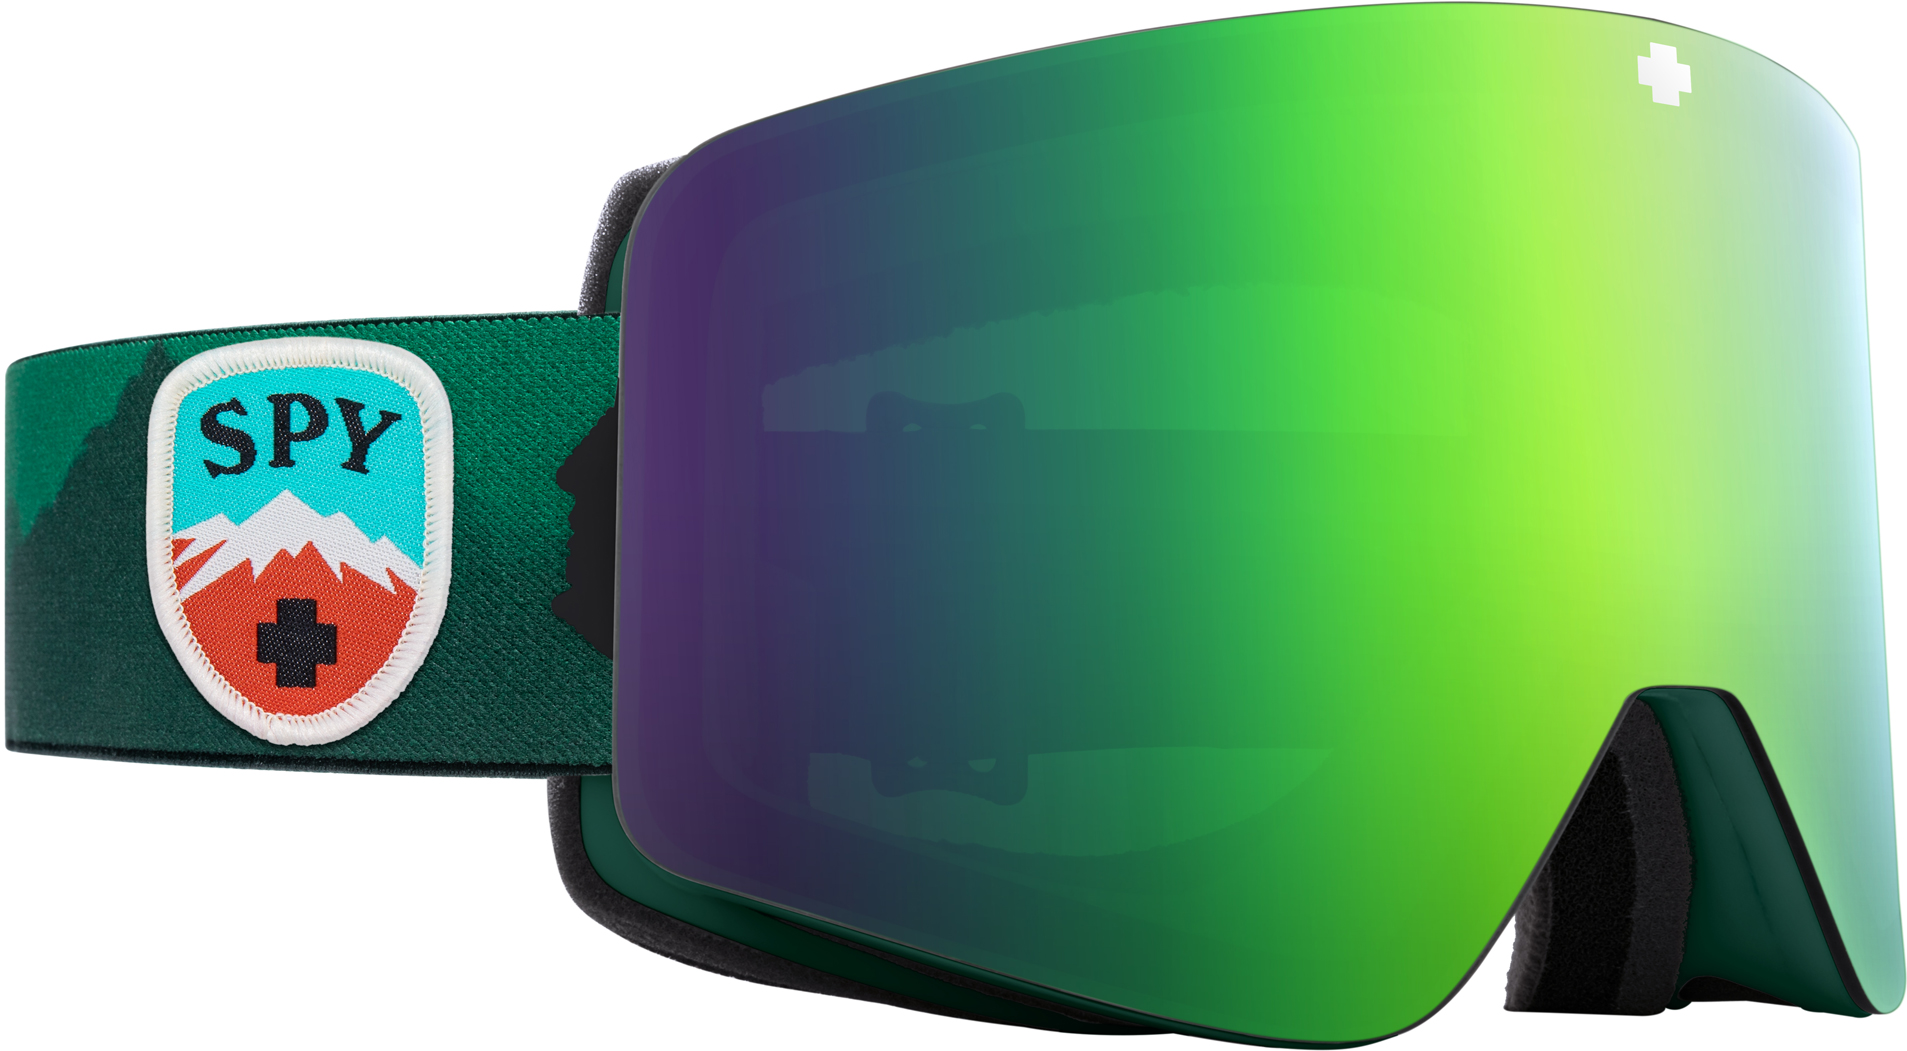 SPY 20 Marauder goggle